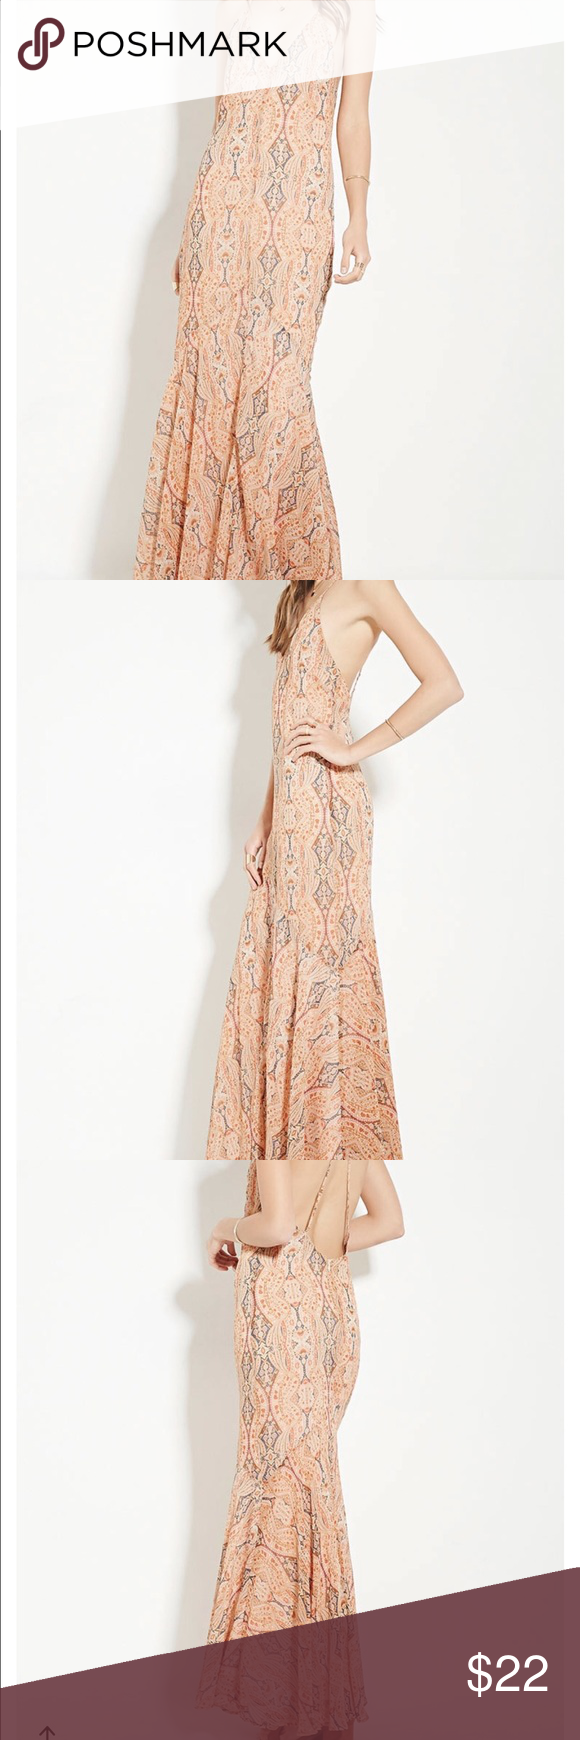 Brand new forever dress st dresses st and customer support